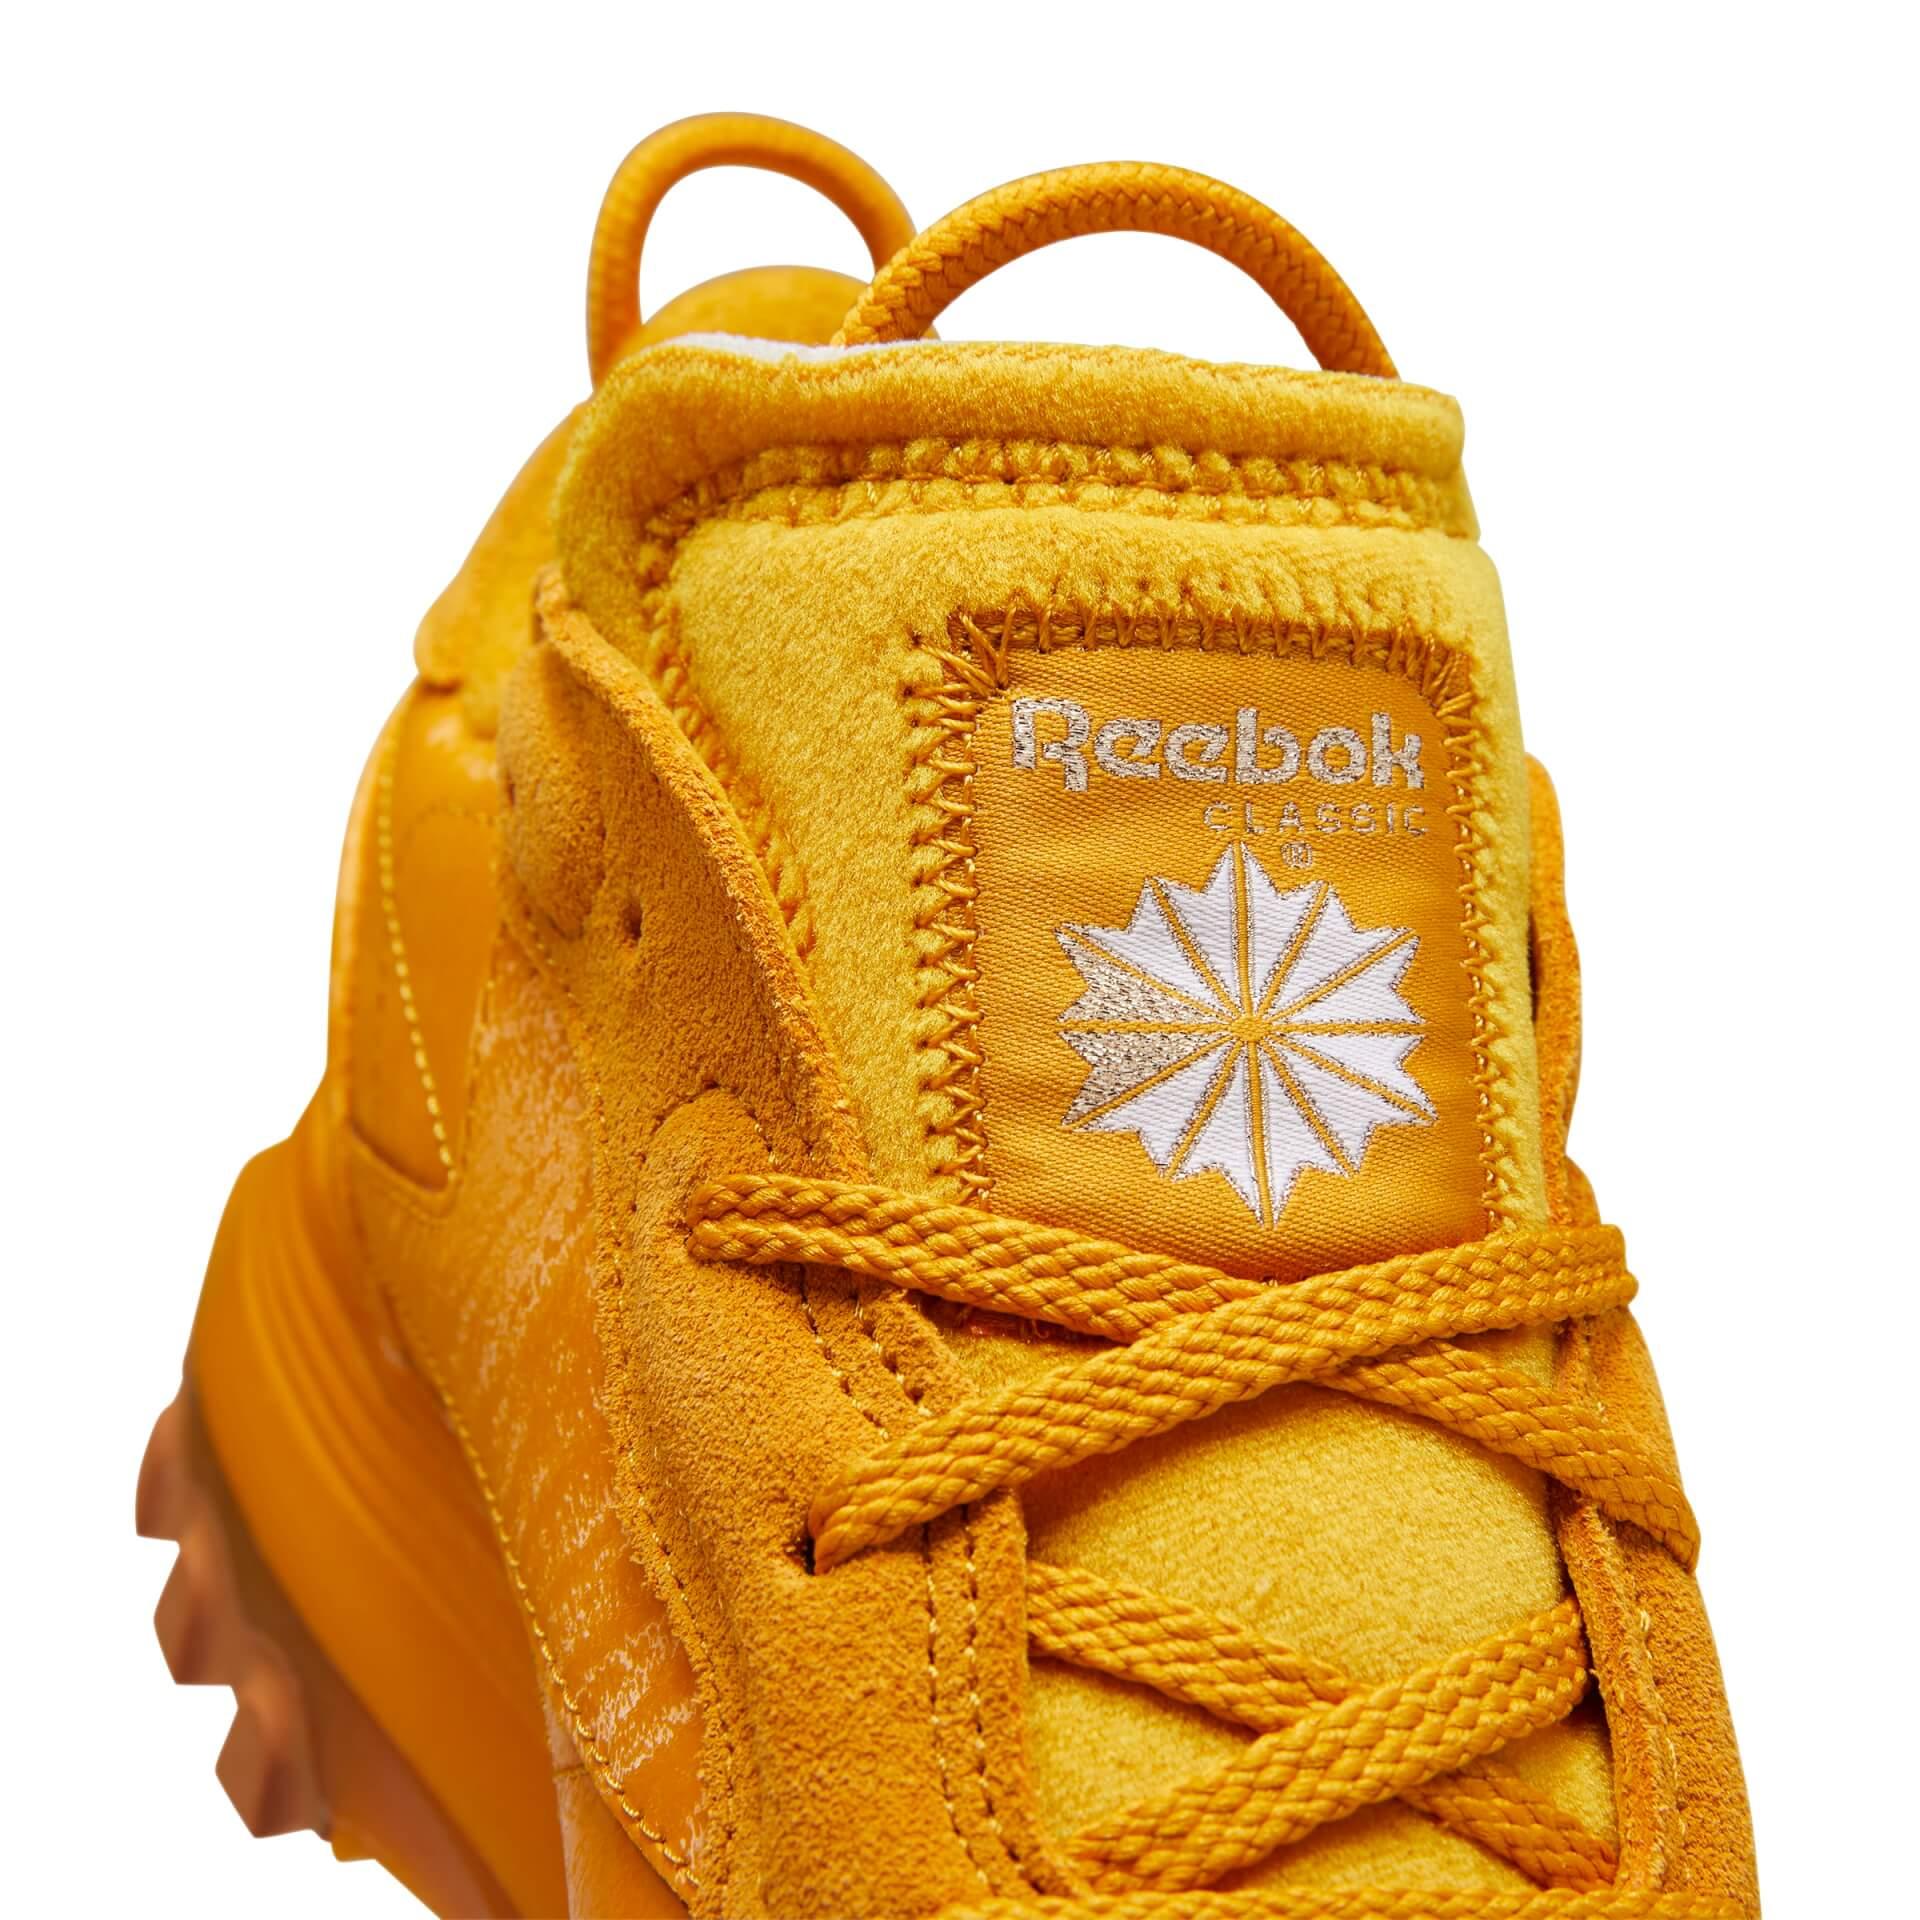 Cardi BとReebokのコラボコレクションに新モデル「CLASSIC LEATHER CARDI」が登場! Fashion_210713_cardib7